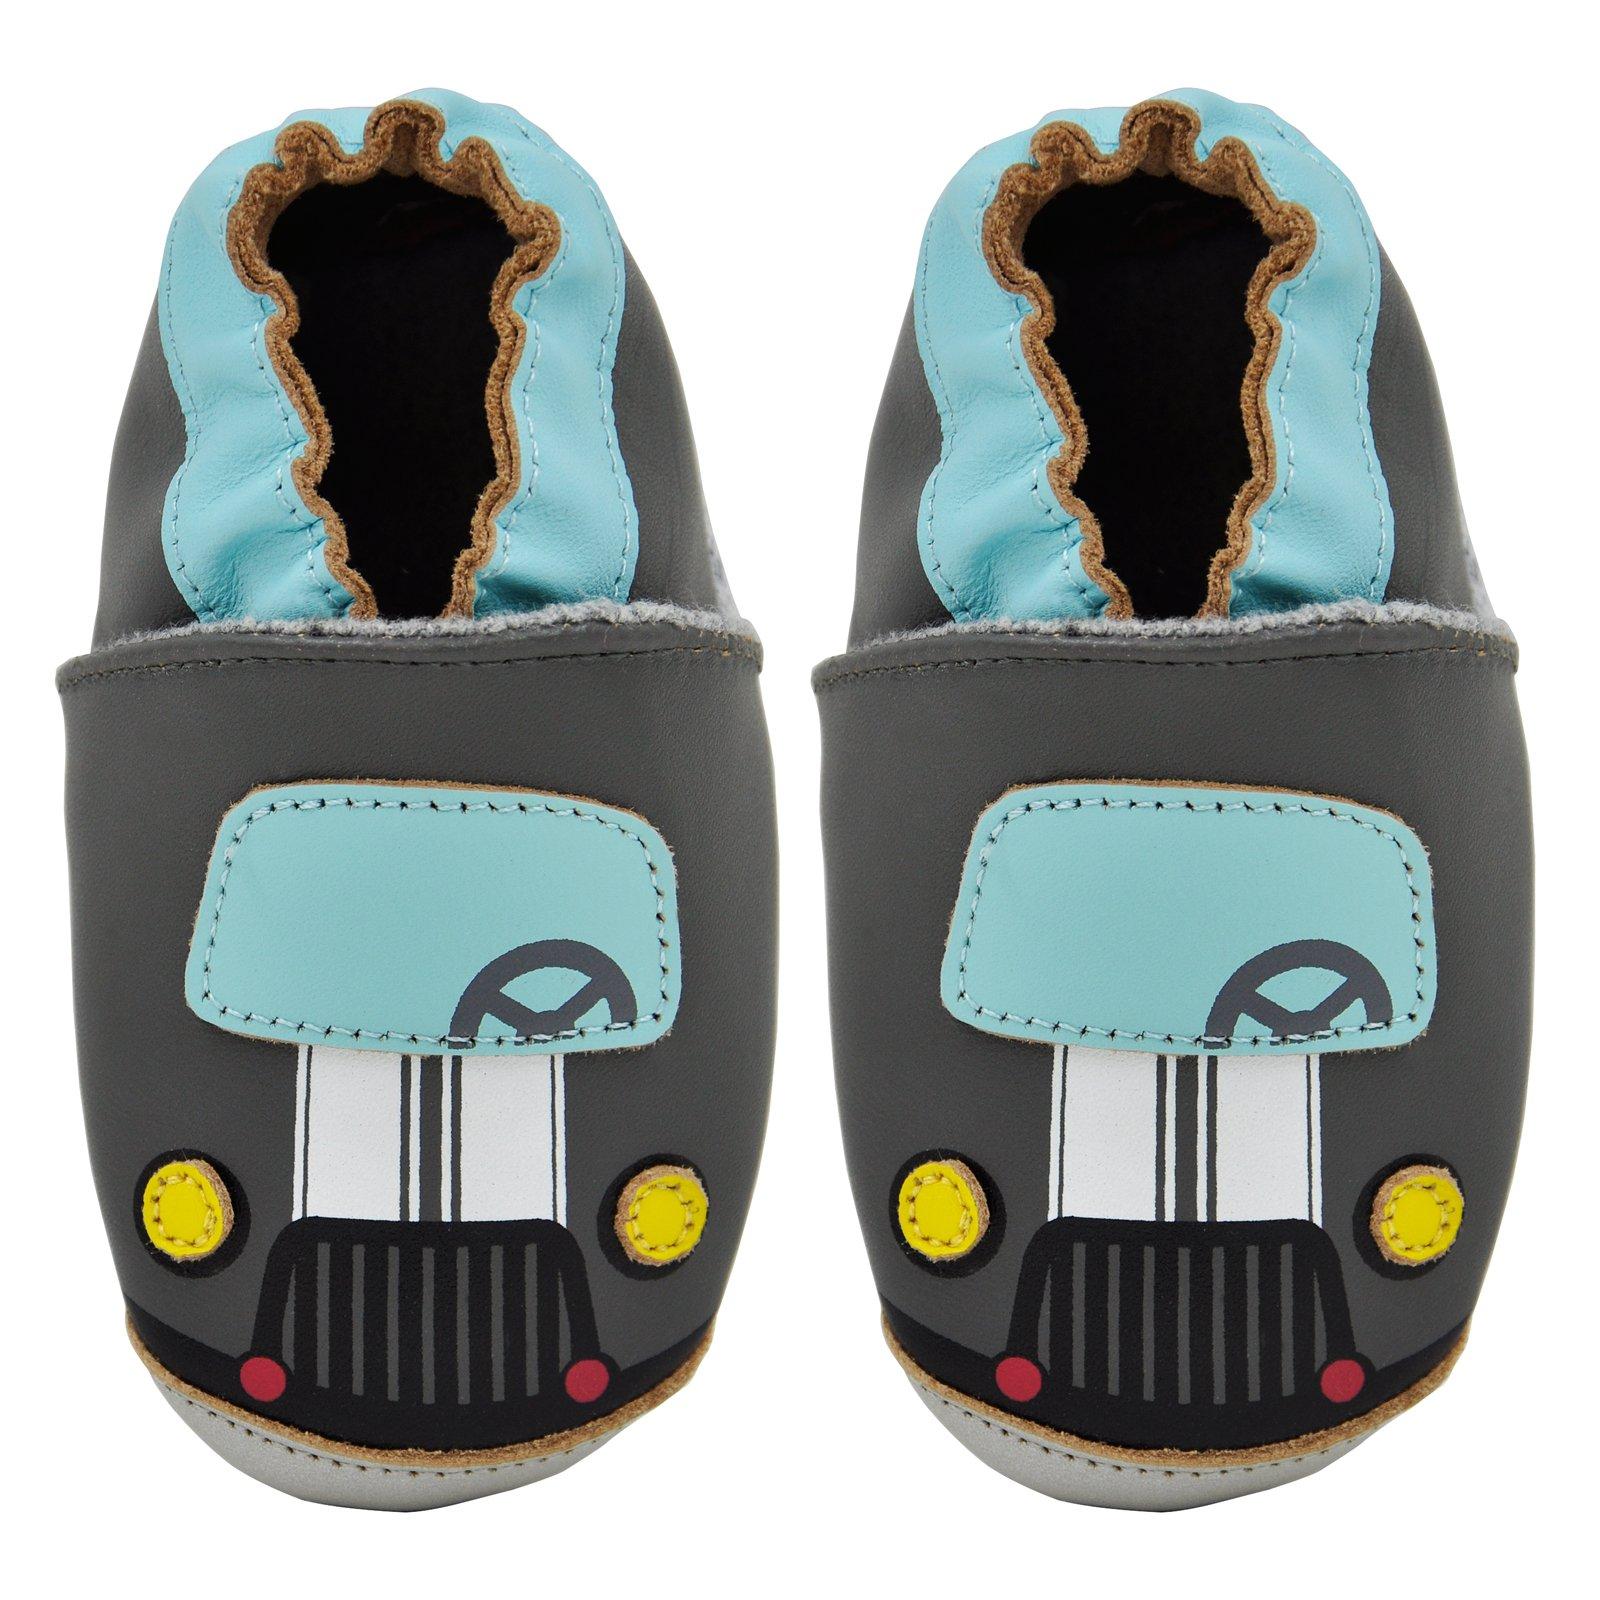 Kimi + Kai Baby Boys Lambskin Leather Soft Sole Shoes - Car (12-18 Months) Grey by Kimi & Kai